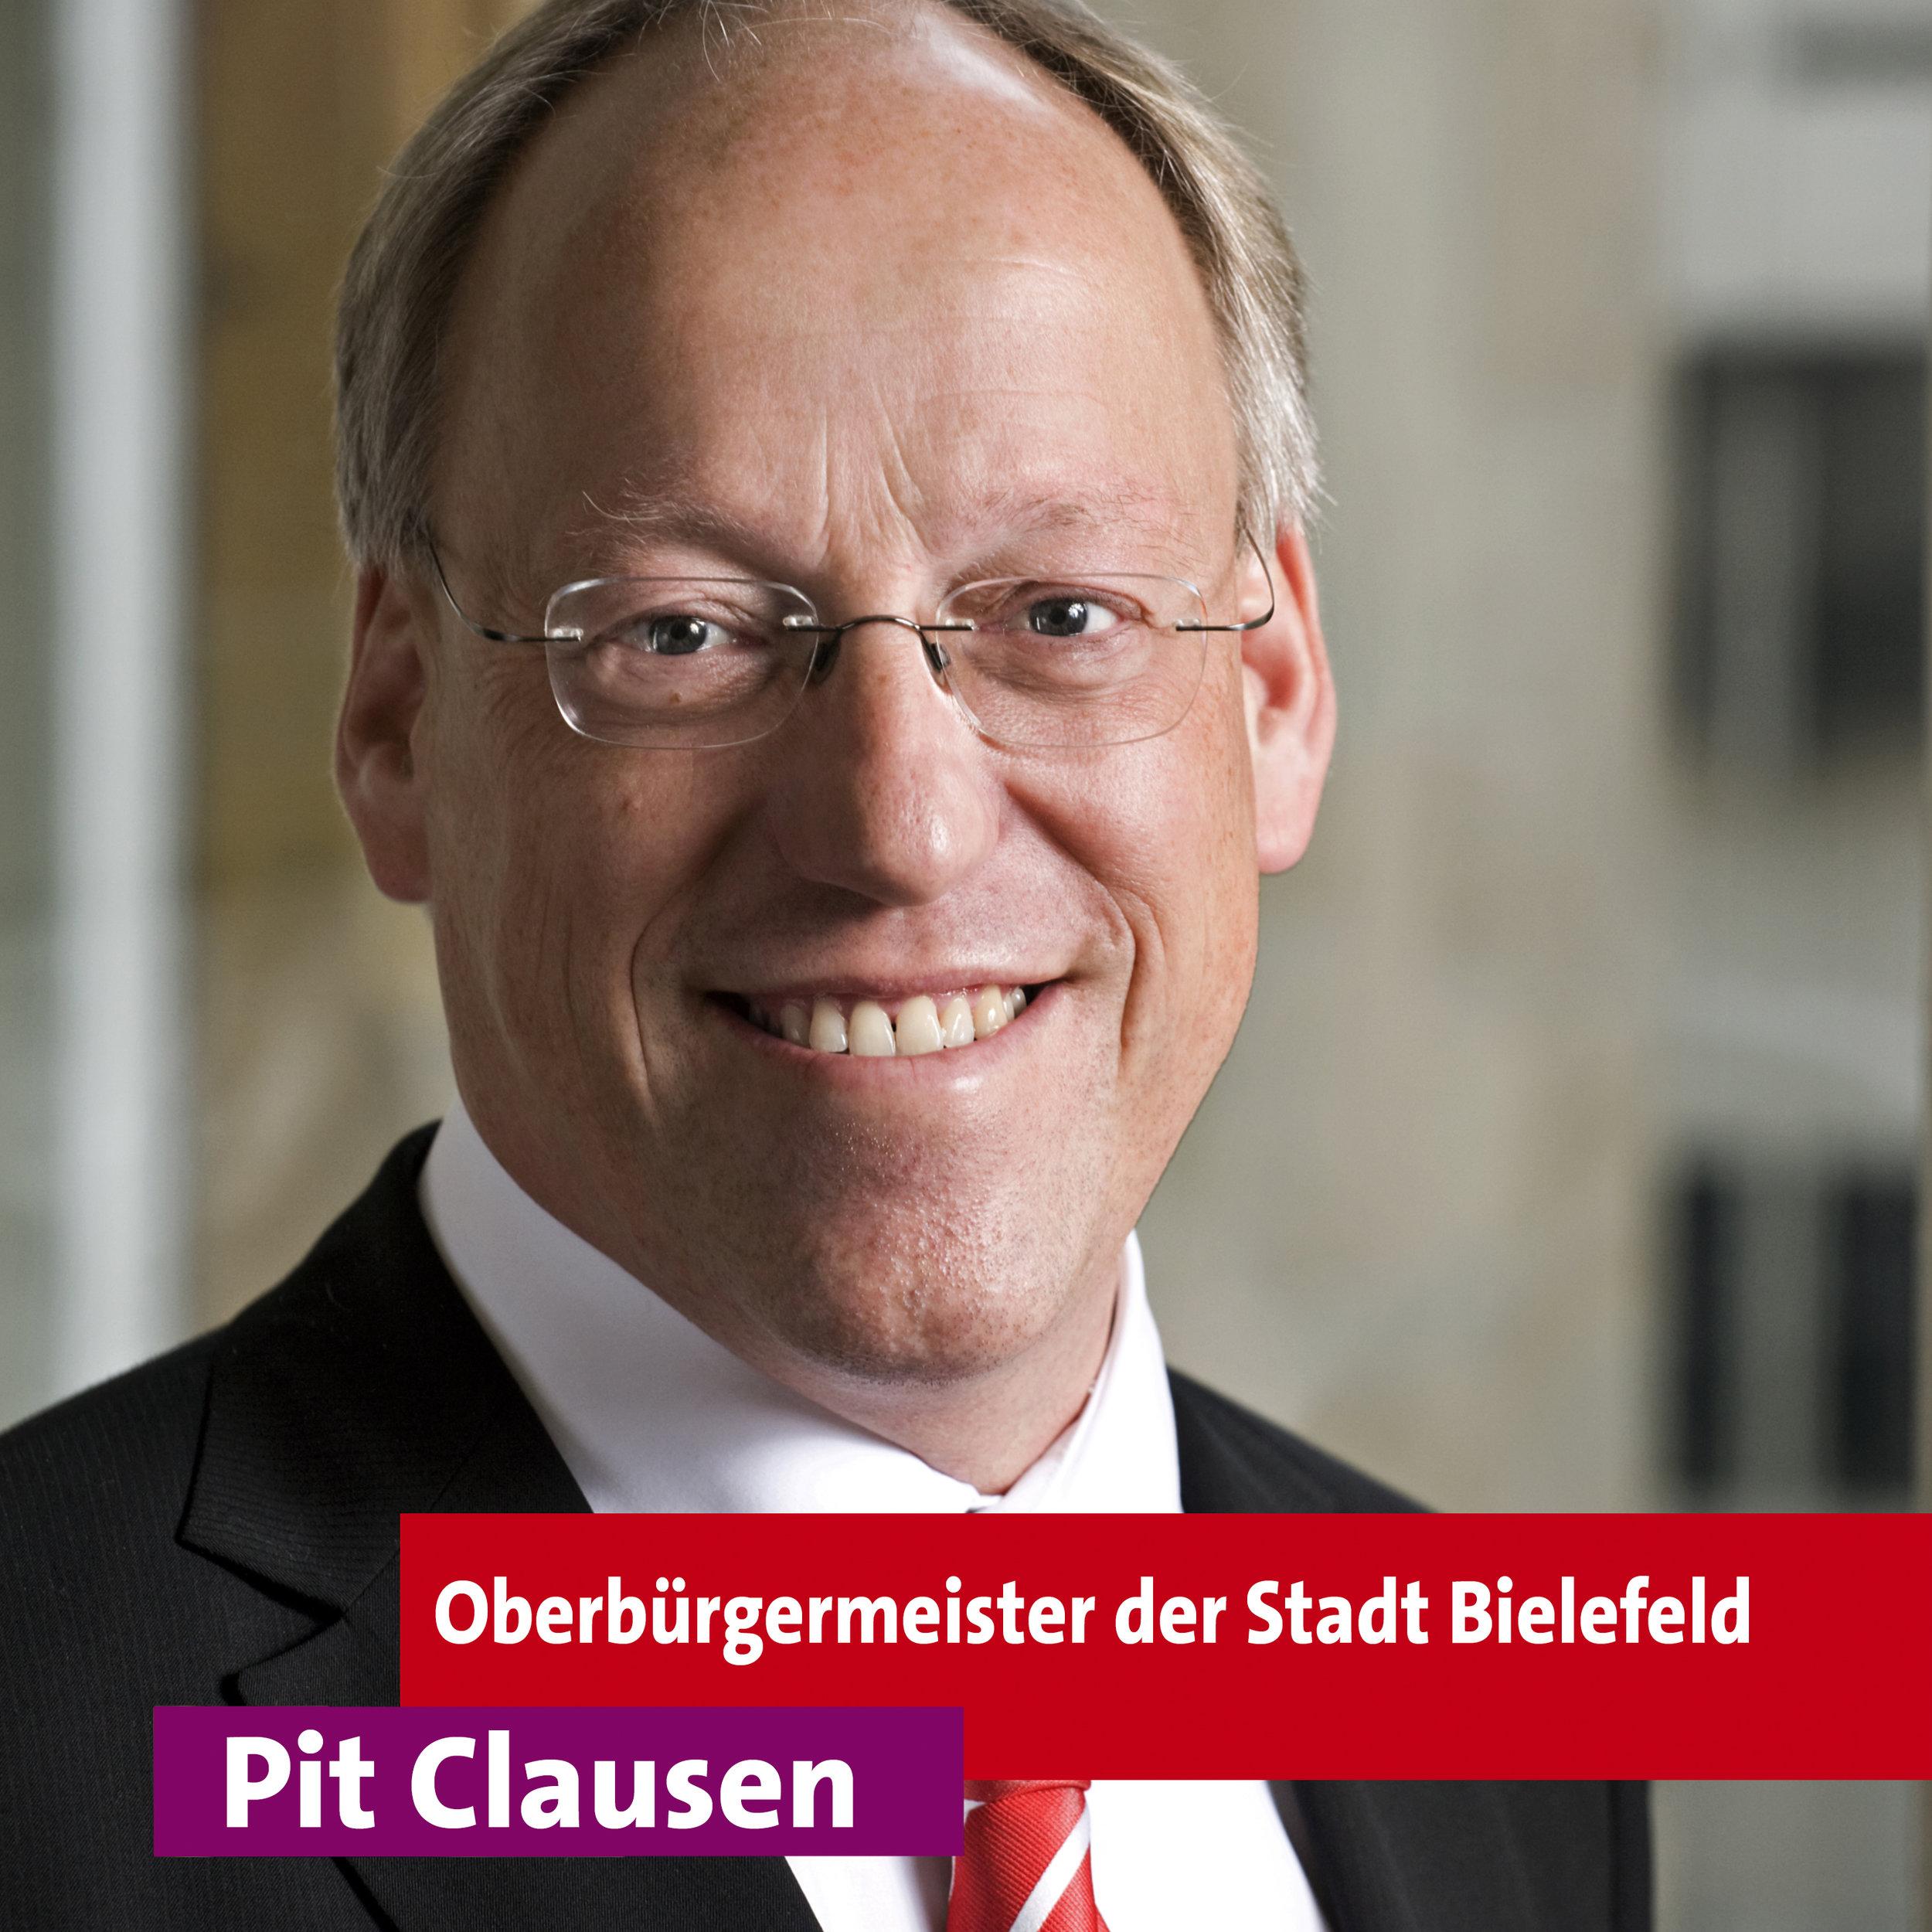 Pit Clausen - Oberbürgermeister